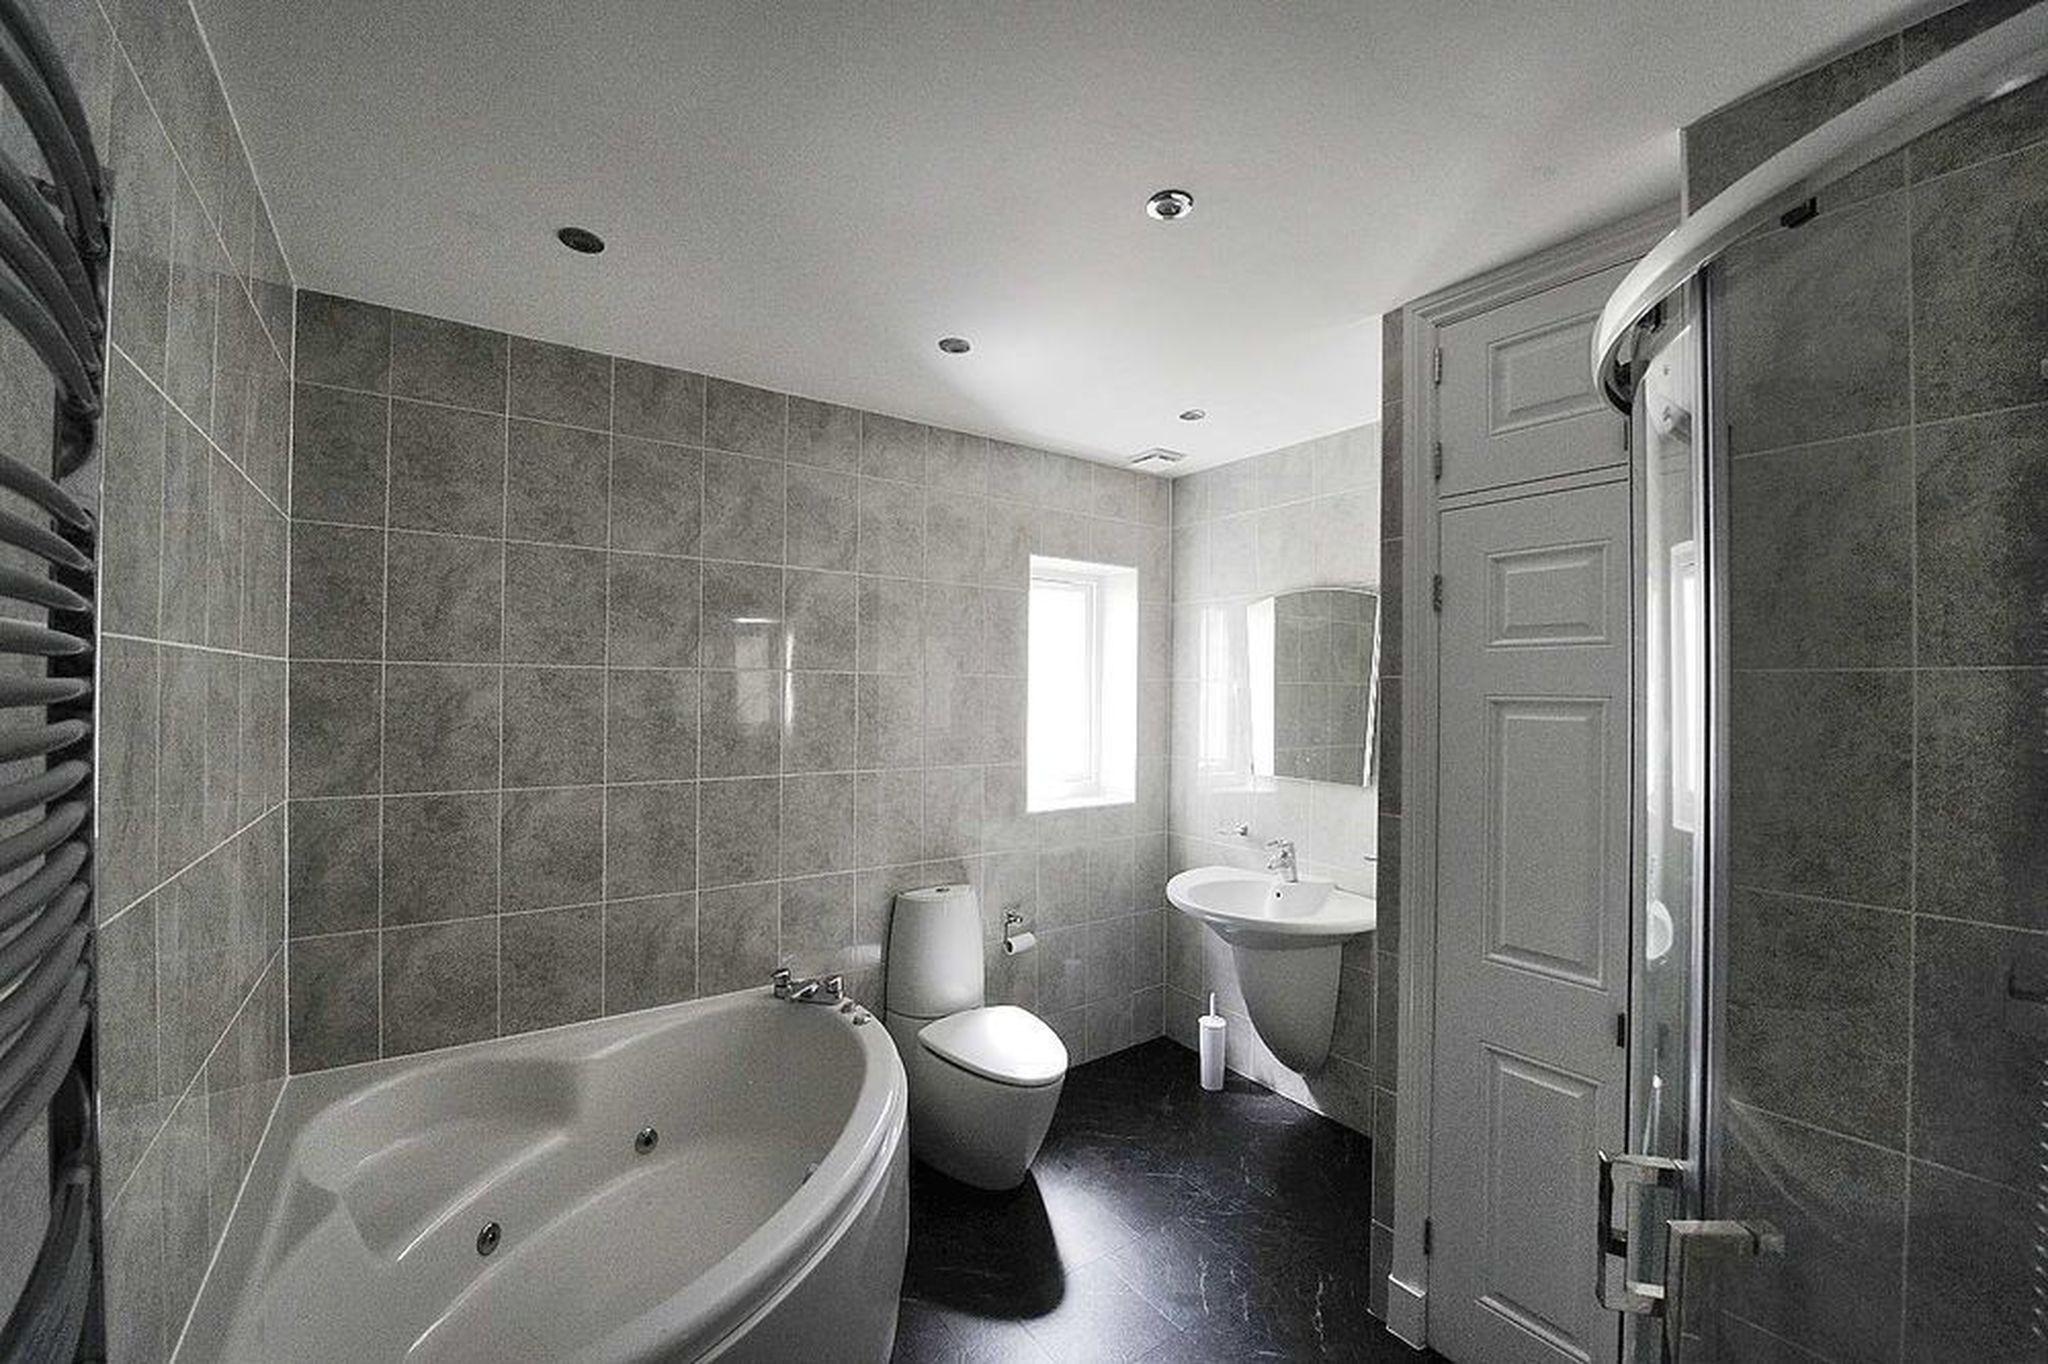 Removal internal walls and bathroom refurbishment - Job of ...